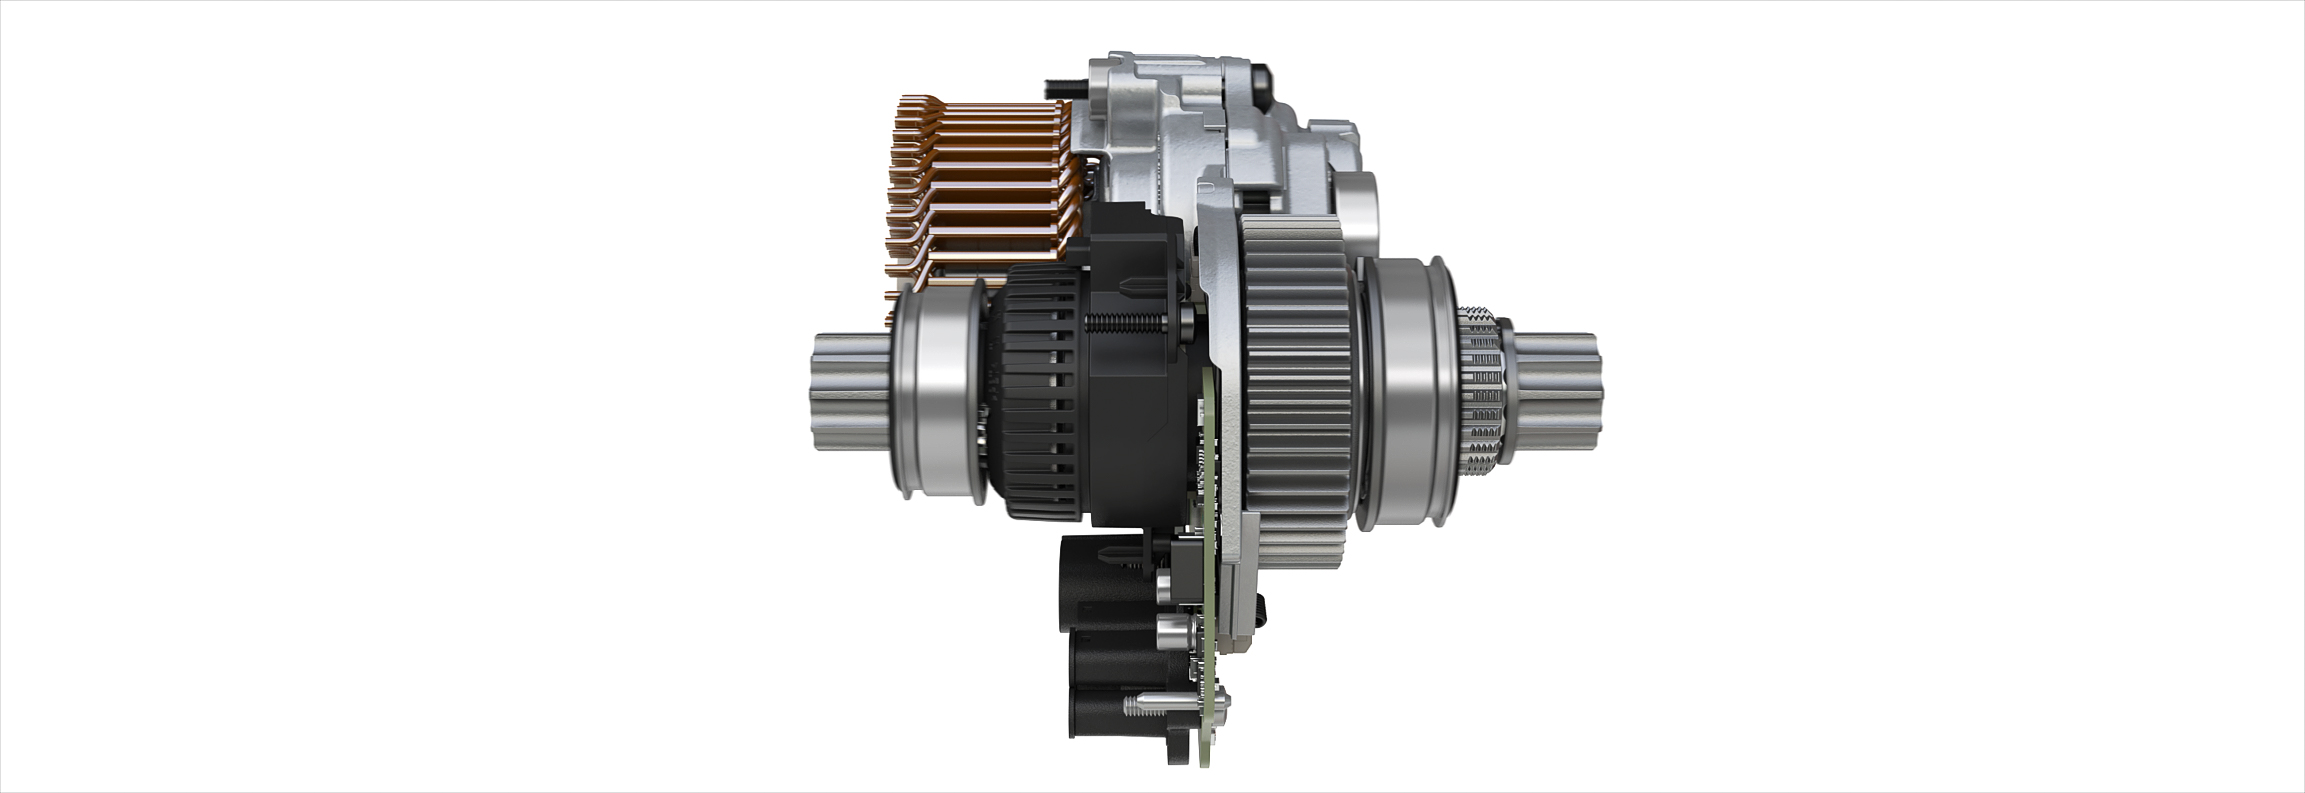 Bosch-eBike-PerformanceLineCX-DriveUnitA